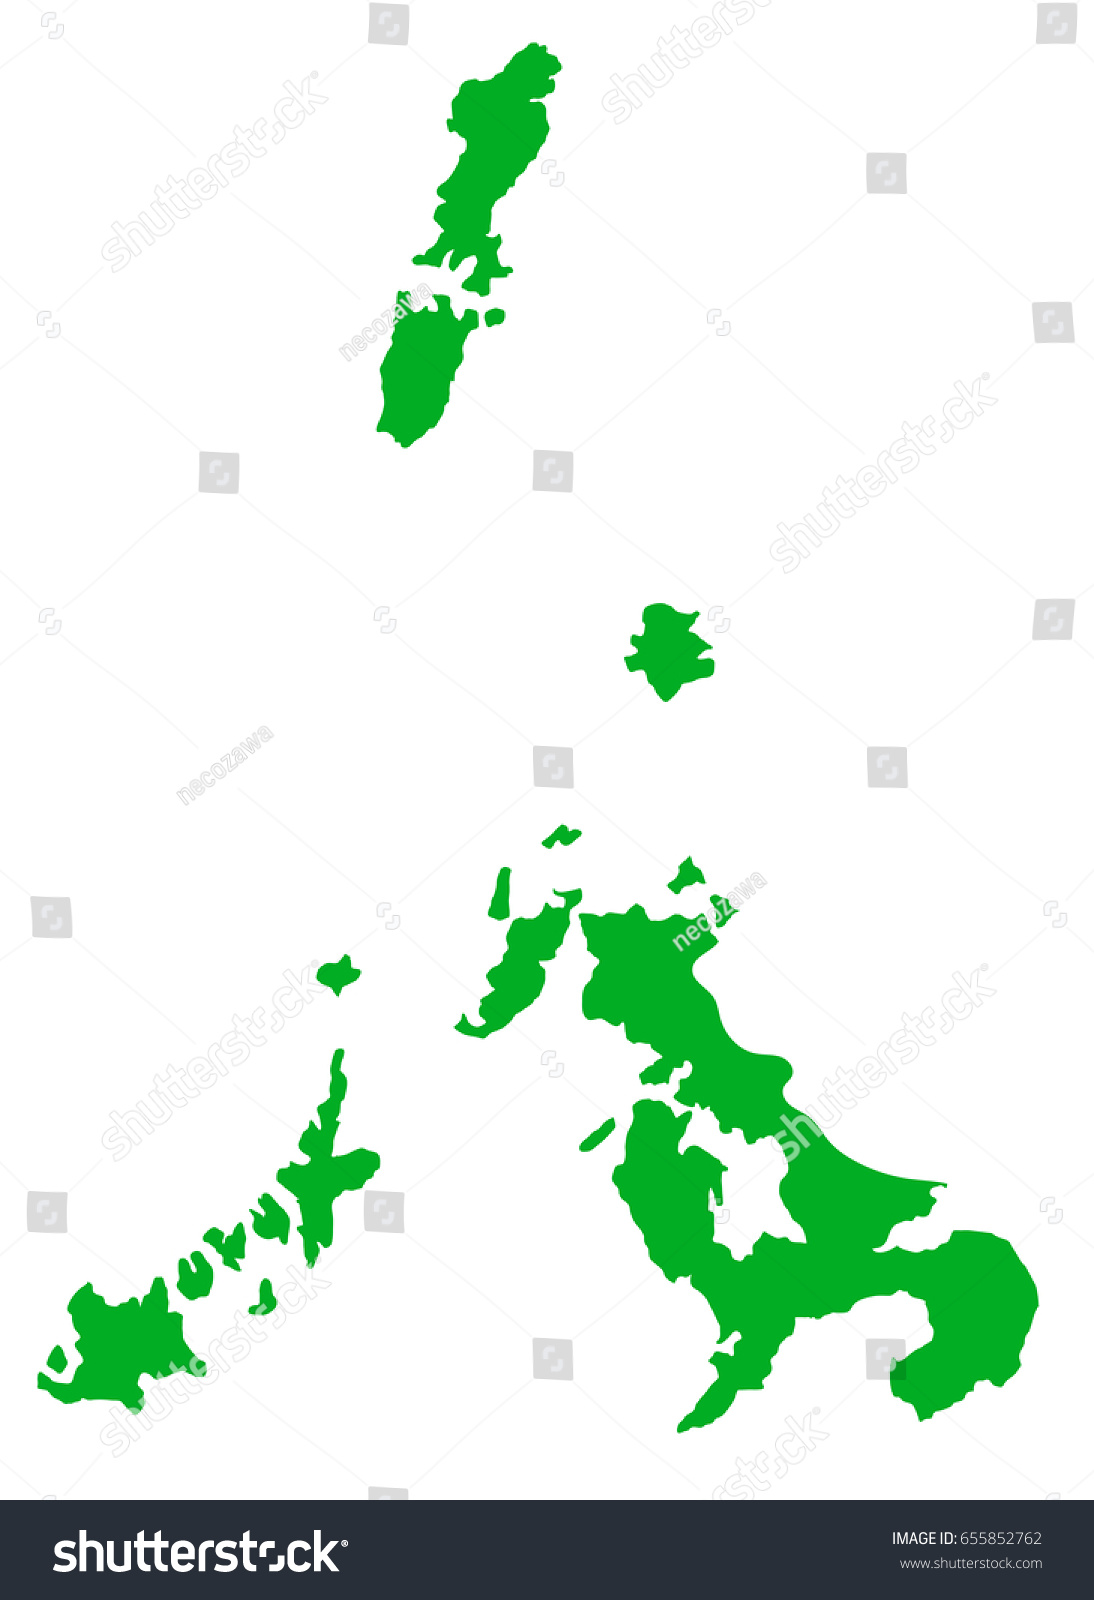 Japan Map Nagasaki Prefecture Stock Vector Shutterstock - Japan map nagasaki